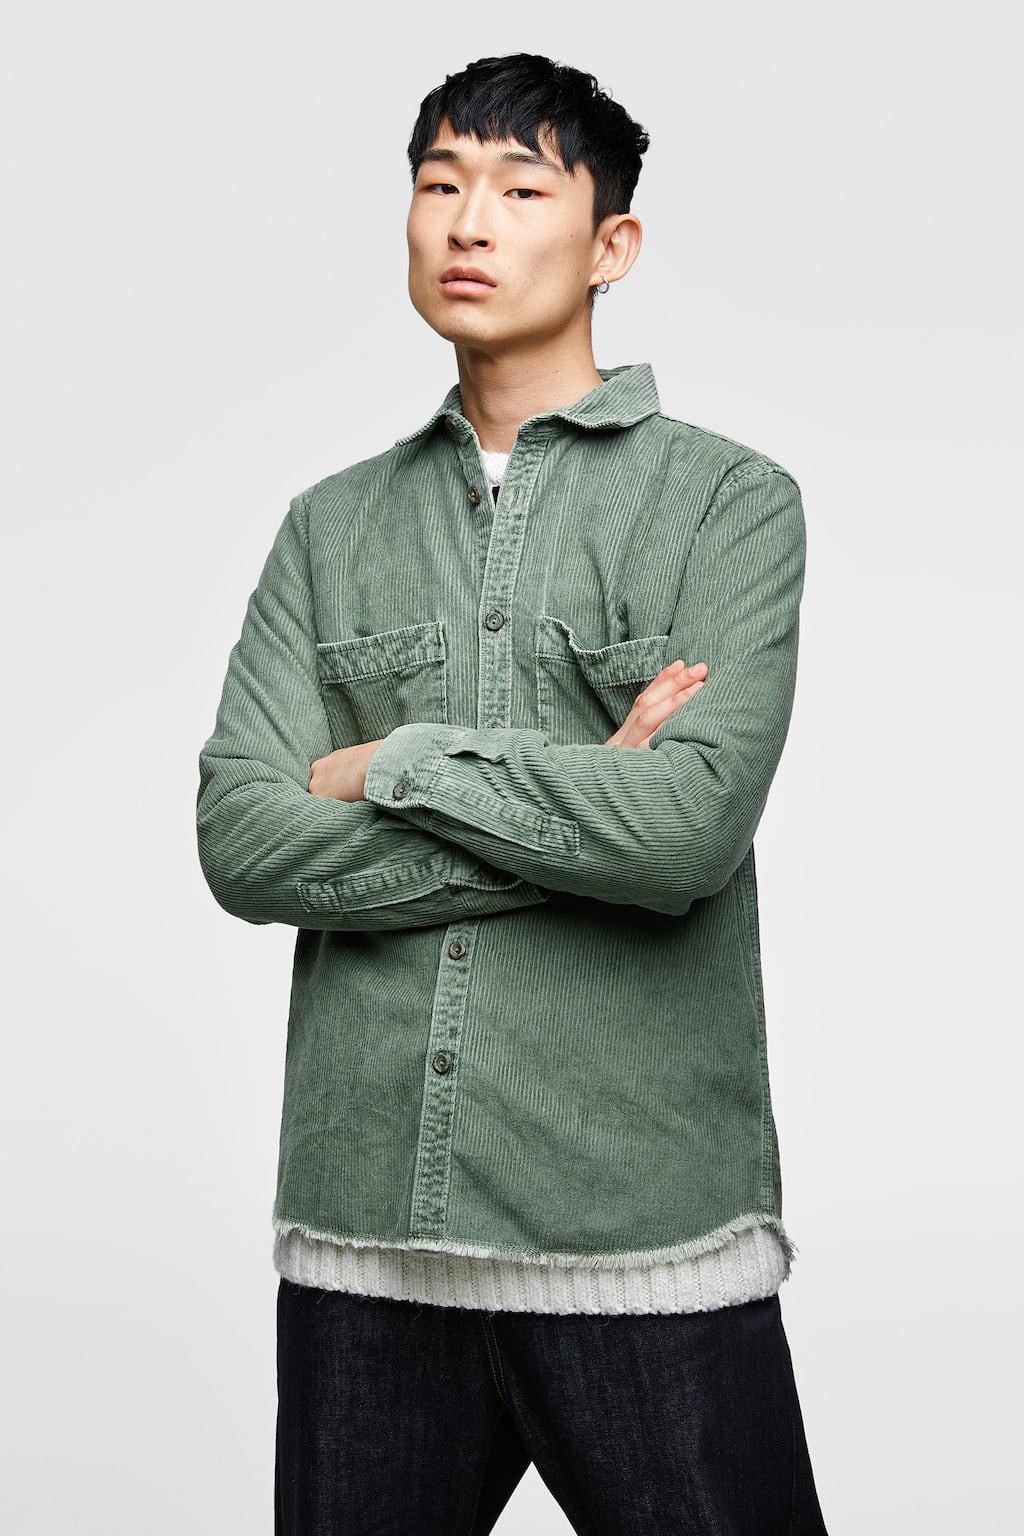 Zara CORDUROY SHIRT DETAILS $49.90